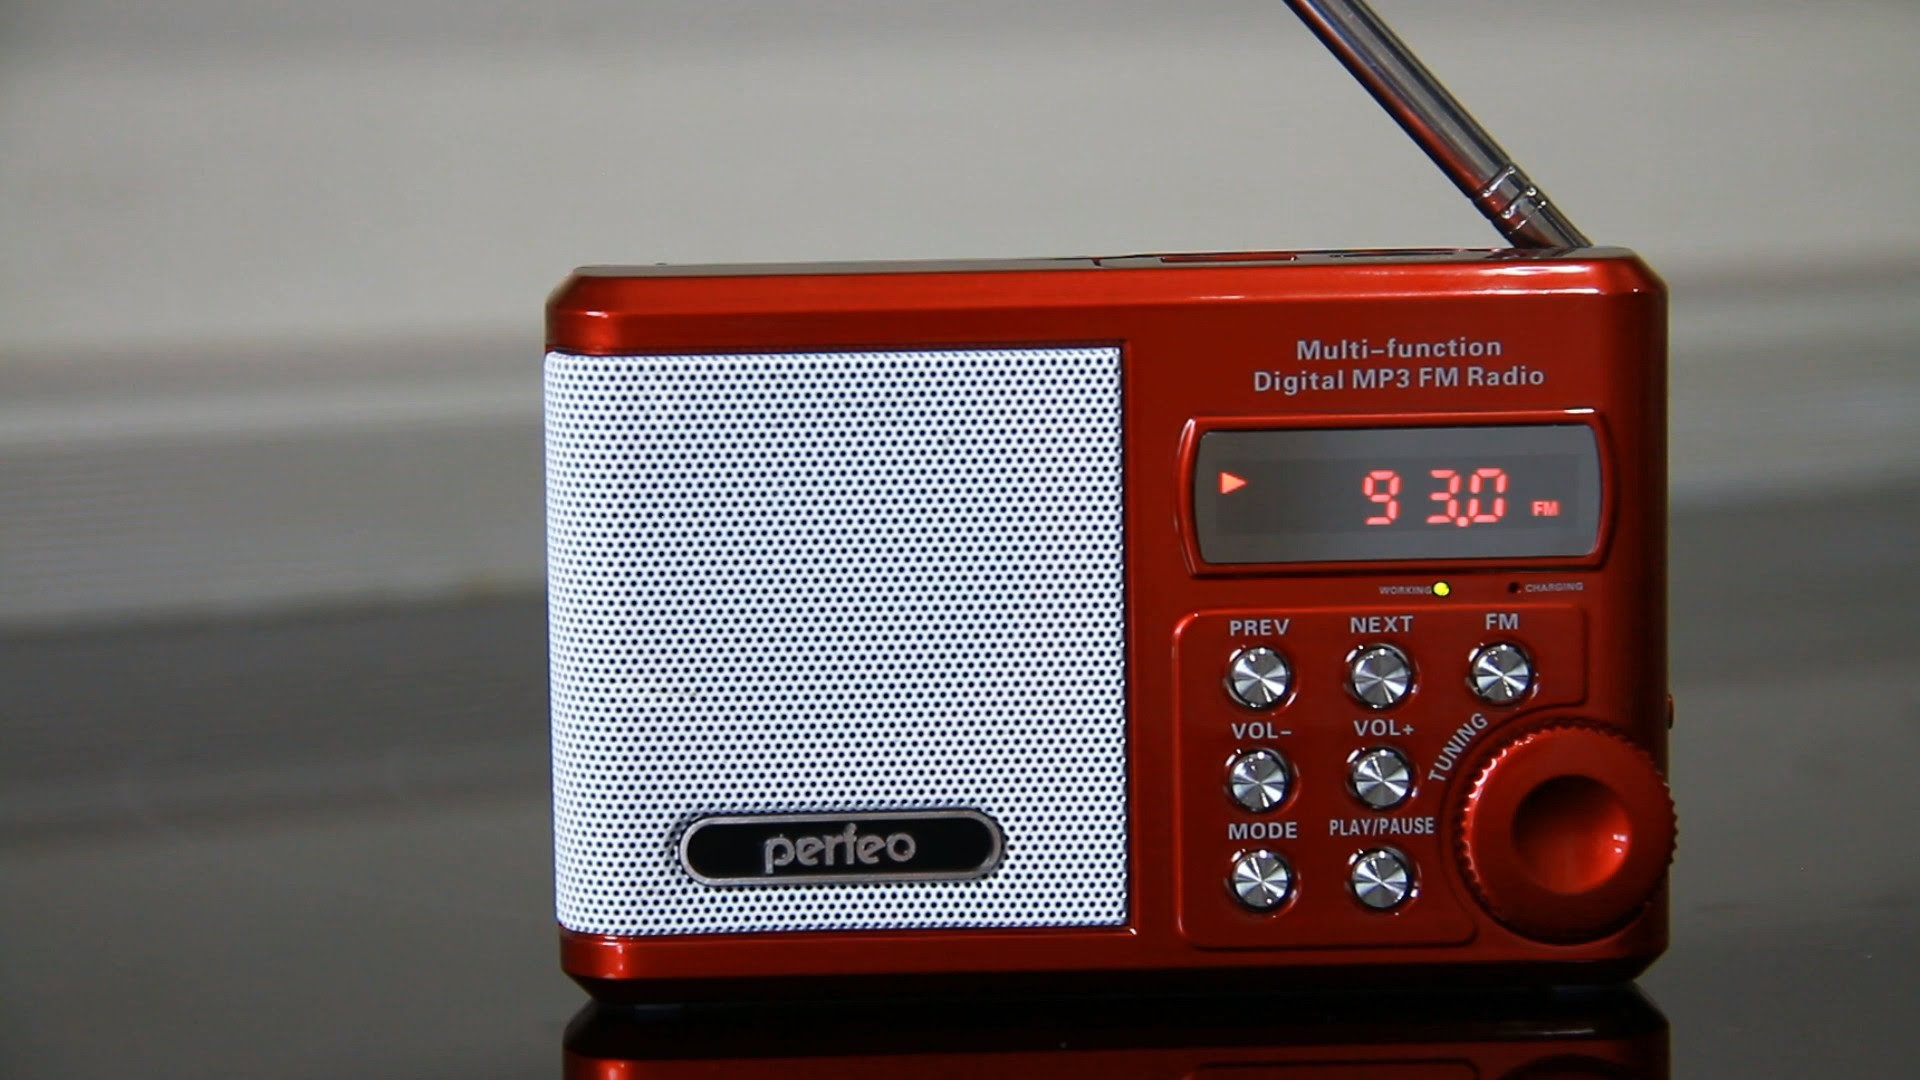 Рис. 3. Perfeo PF-SV922.